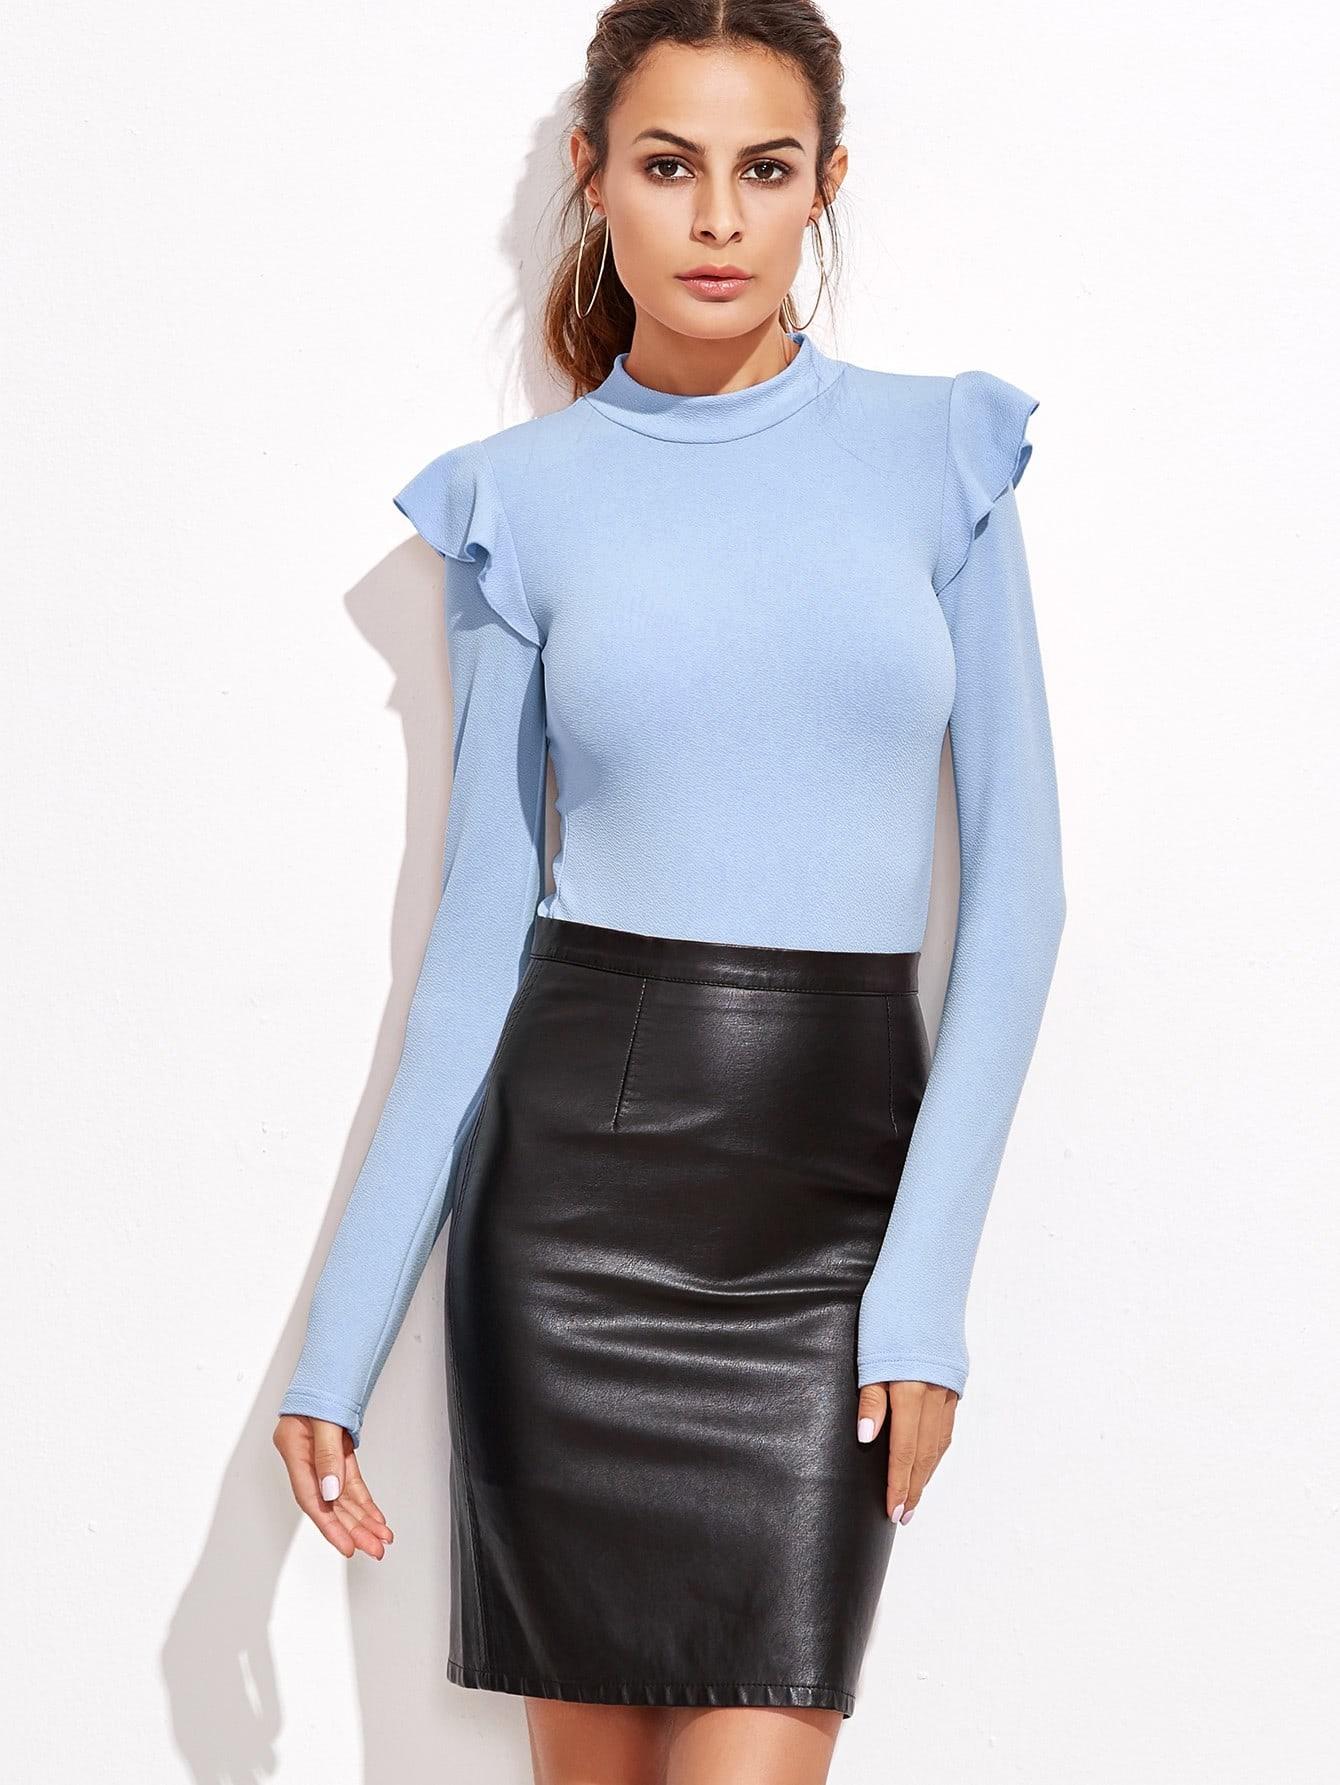 Mock Neck Frill Detail Textured Bodysuit frill sleeve tape detail sweatshirt